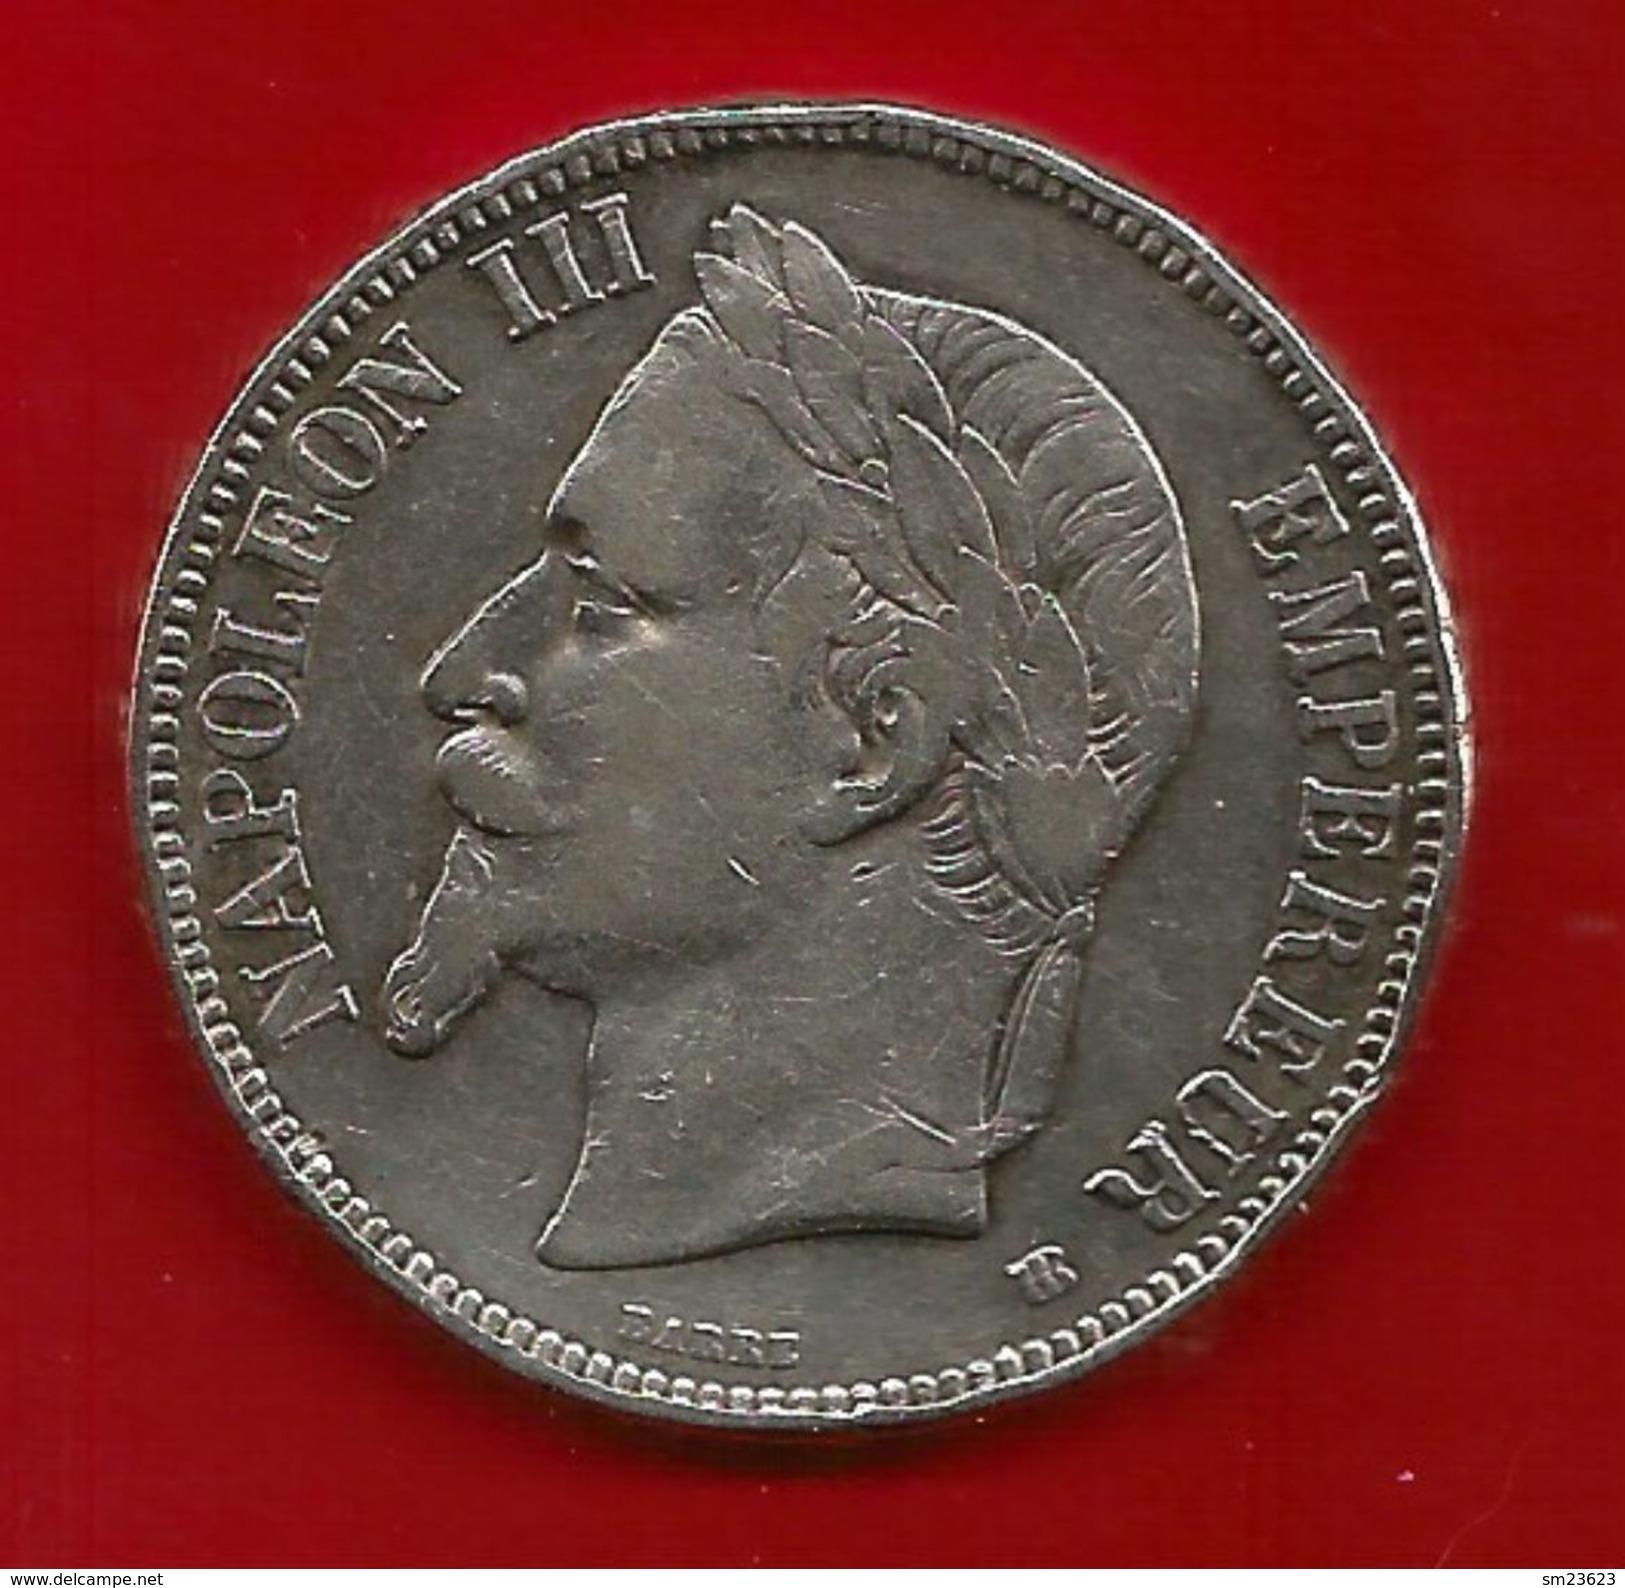 Frankreich 1869 (BB) , Empire Francais - Napoleon III Empereur - Silbermünze - - France